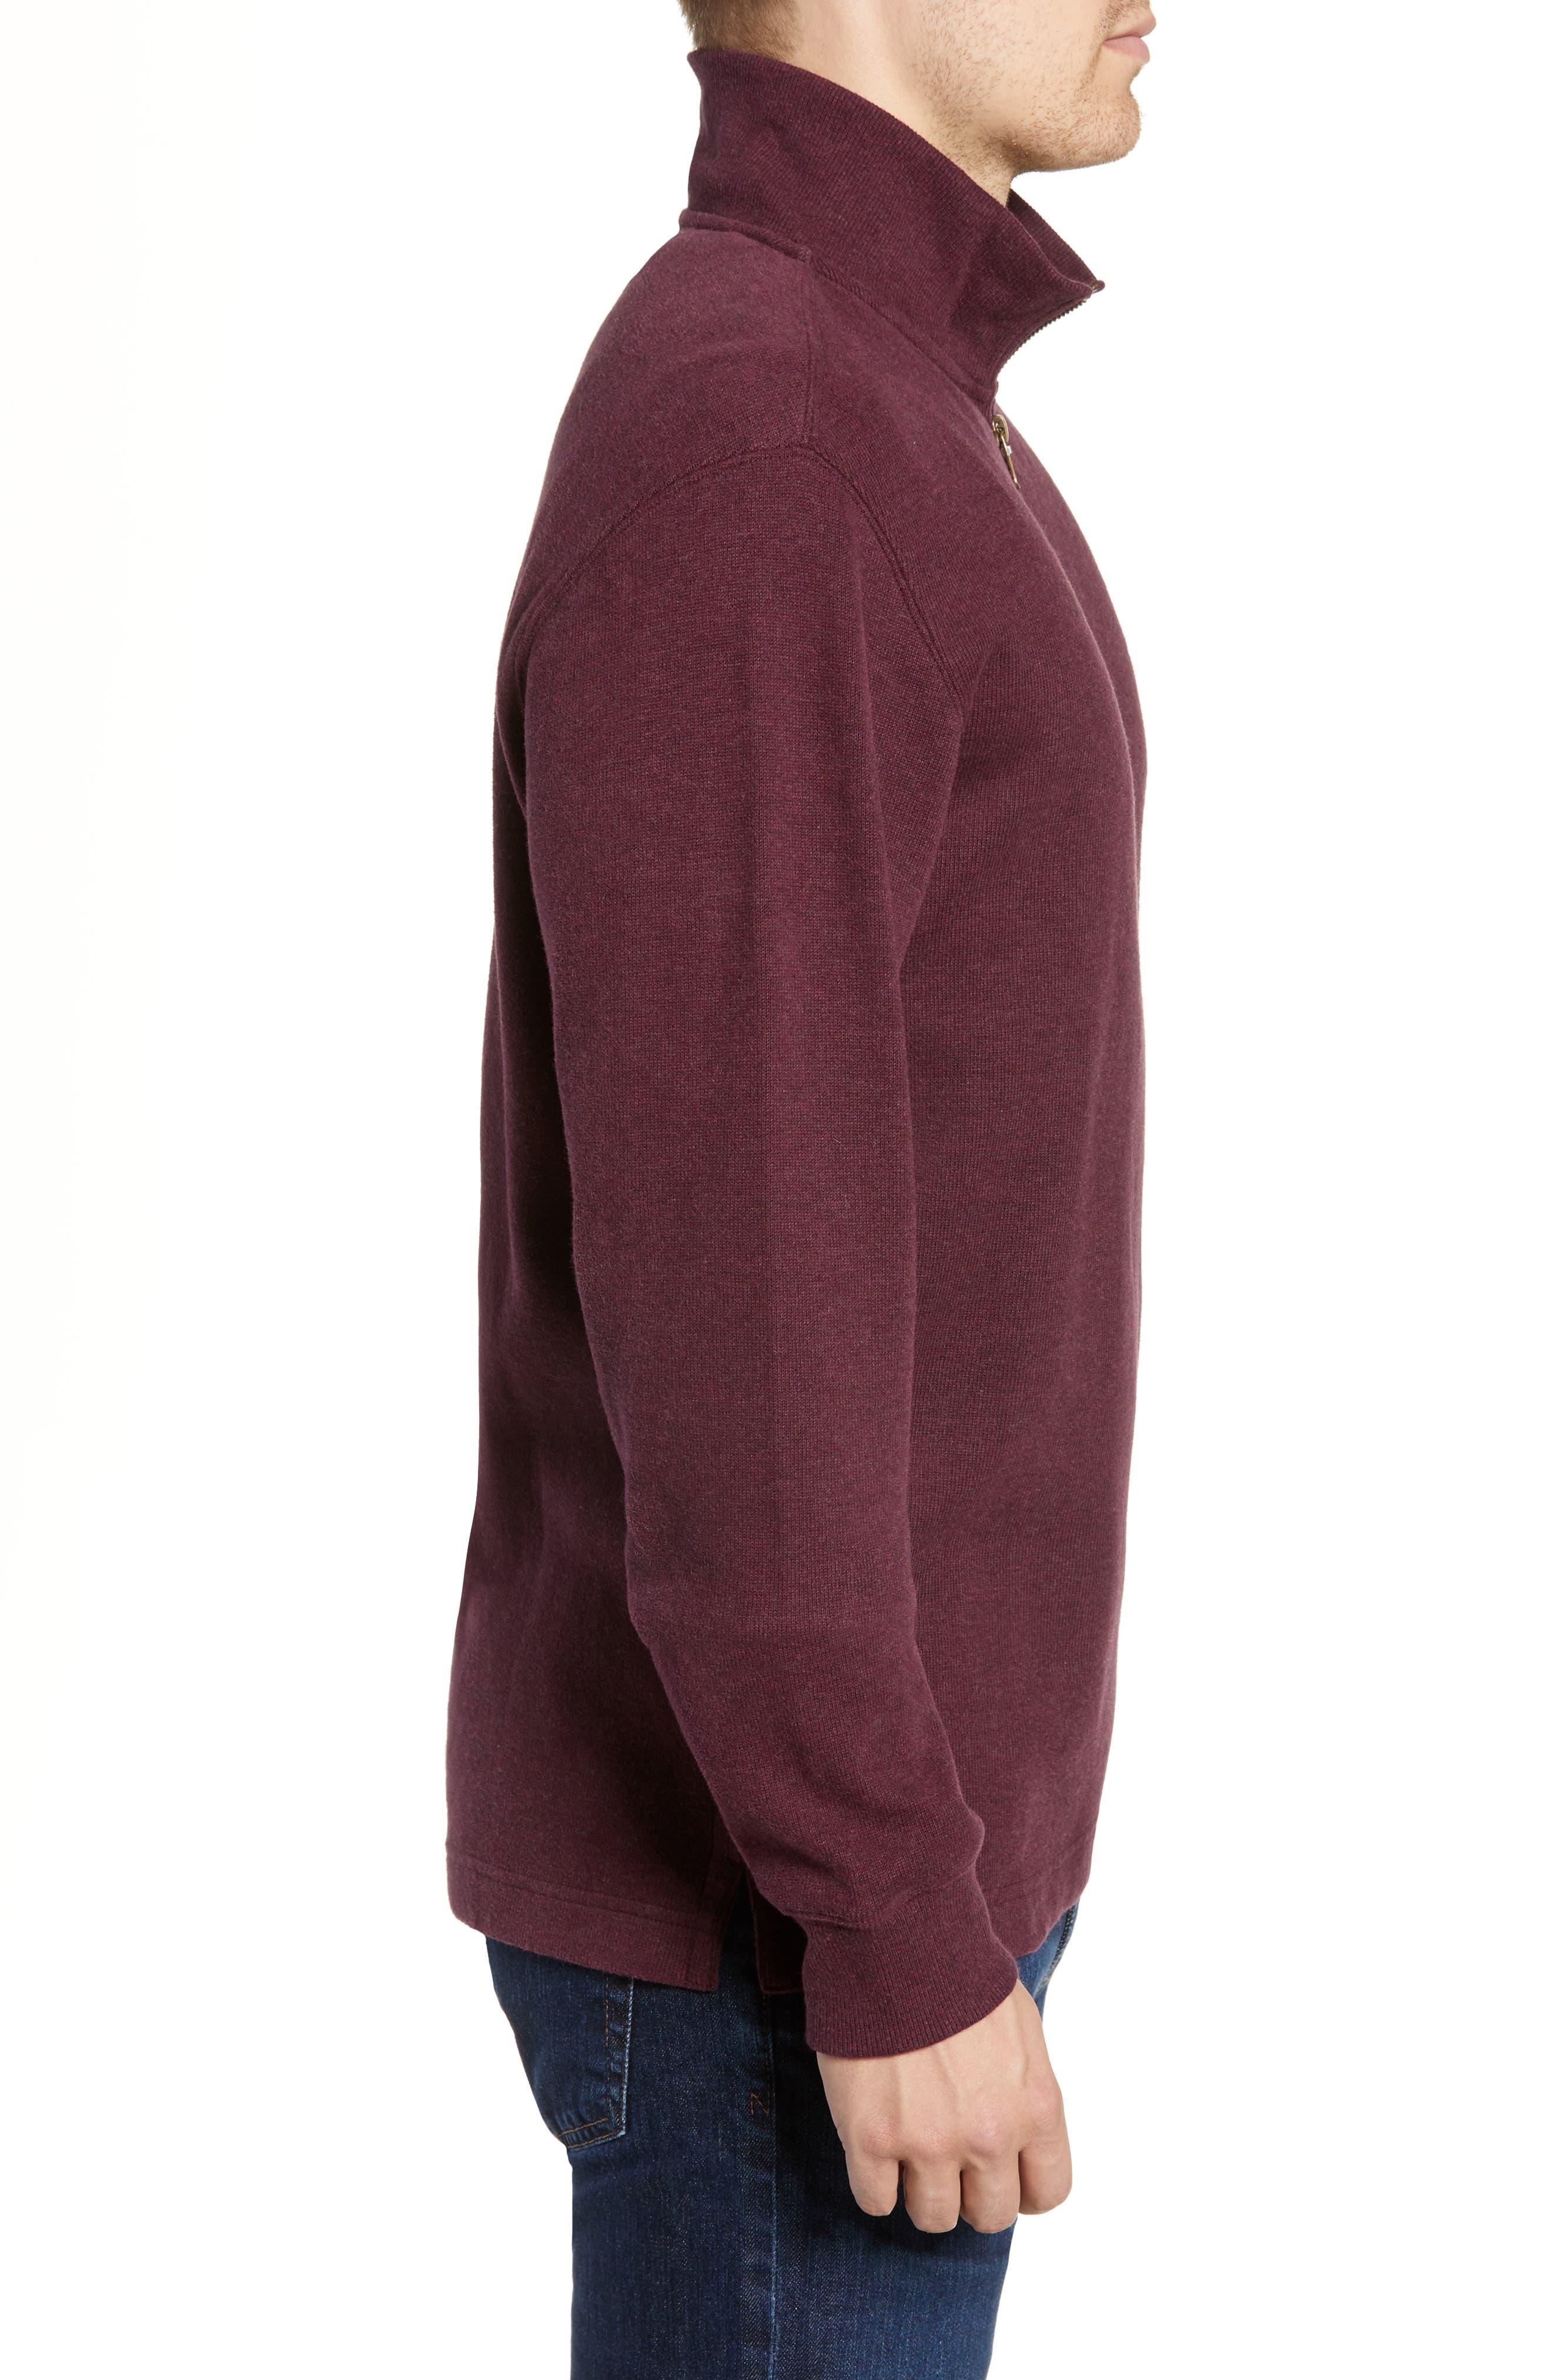 RODD & GUNN, Alton Ave Regular Fit Pullover Sweatshirt, Alternate thumbnail 3, color, BURGUNDY